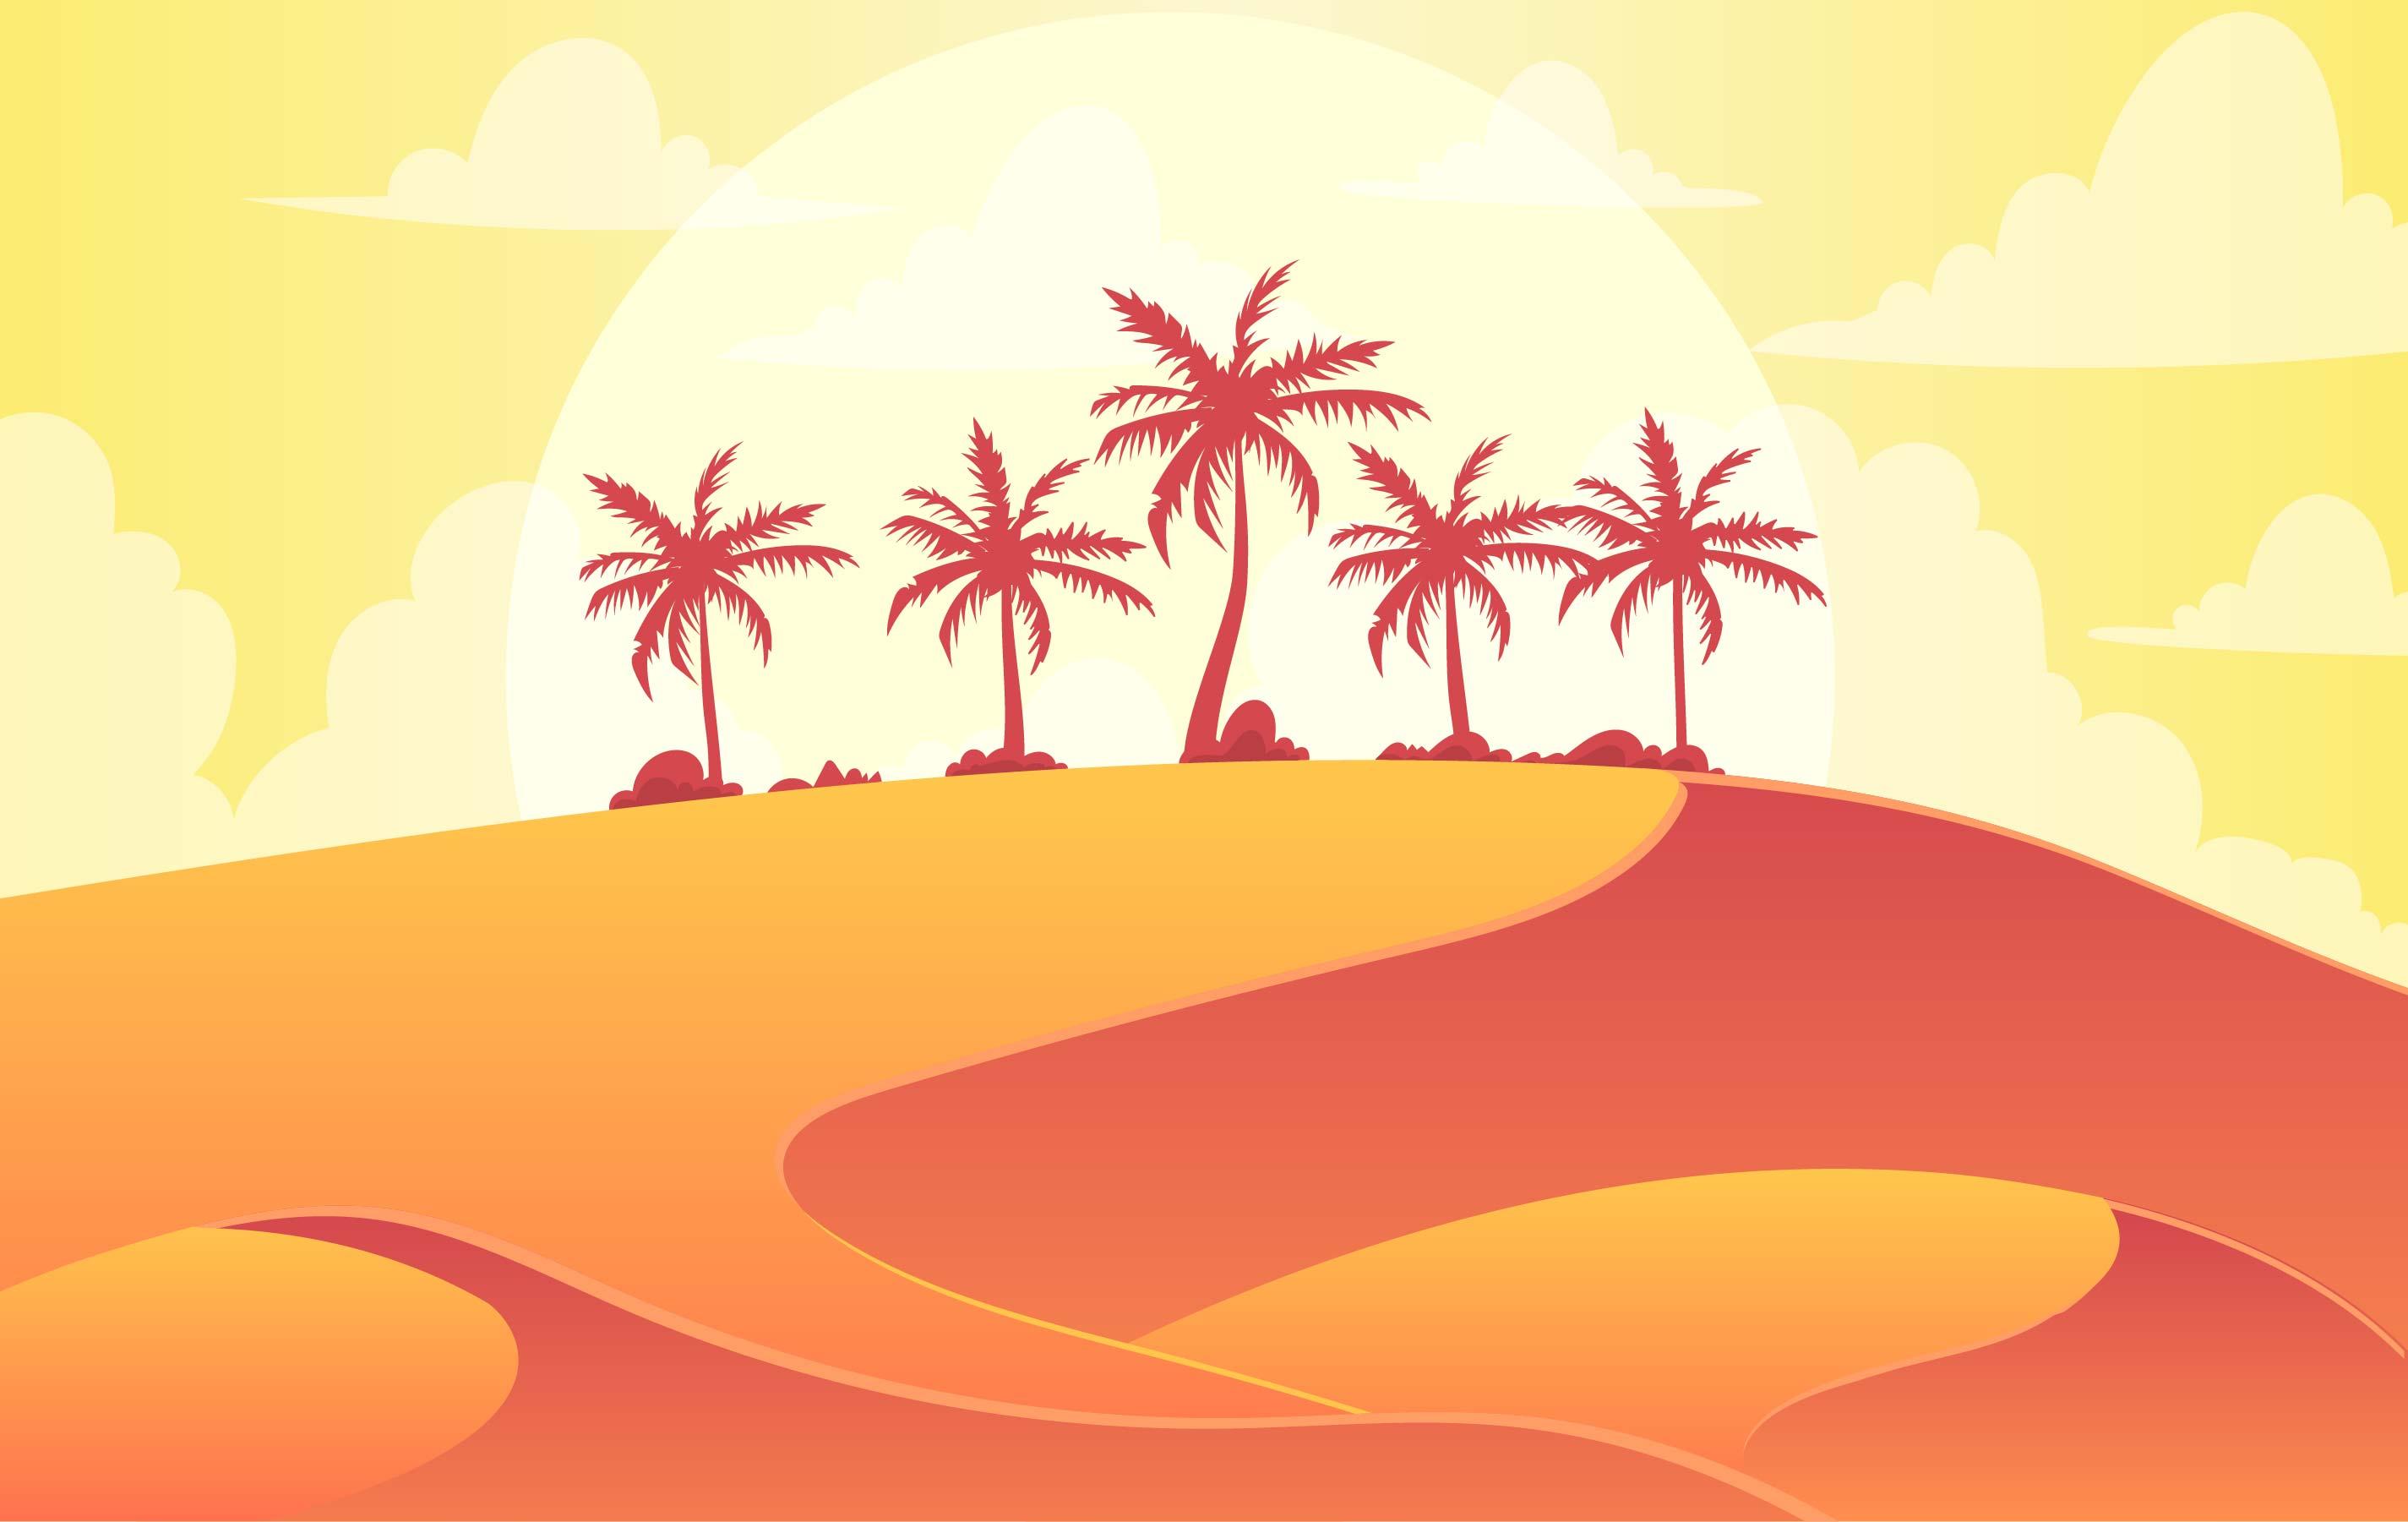 Landscape Illustration Vector Free: Vector Desert Landscape Illustration